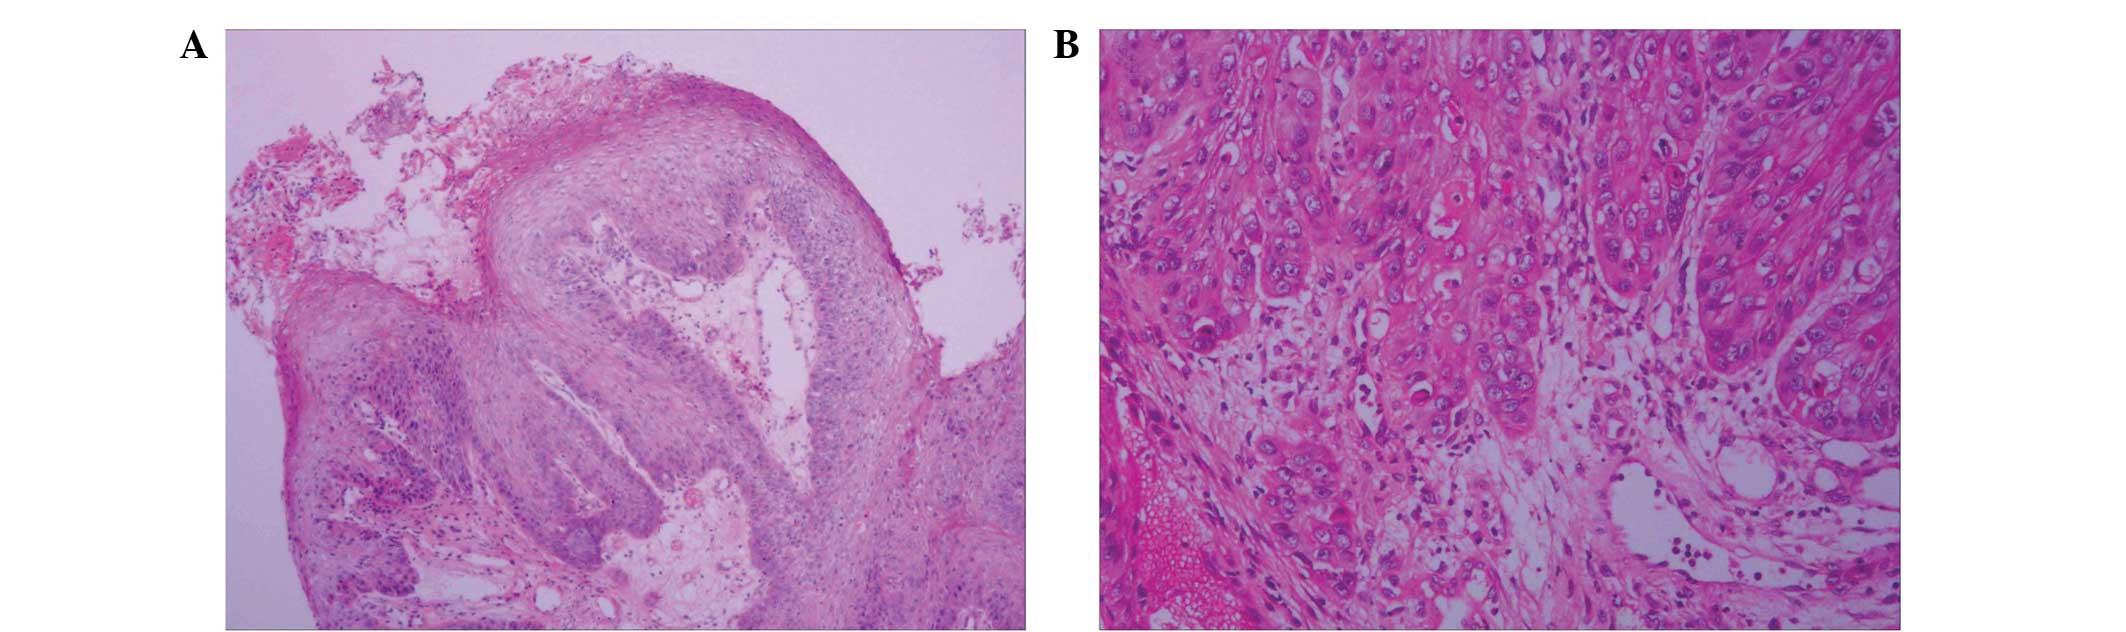 virus del papiloma humano tiene tratamiento papilloma vescicale sintomi